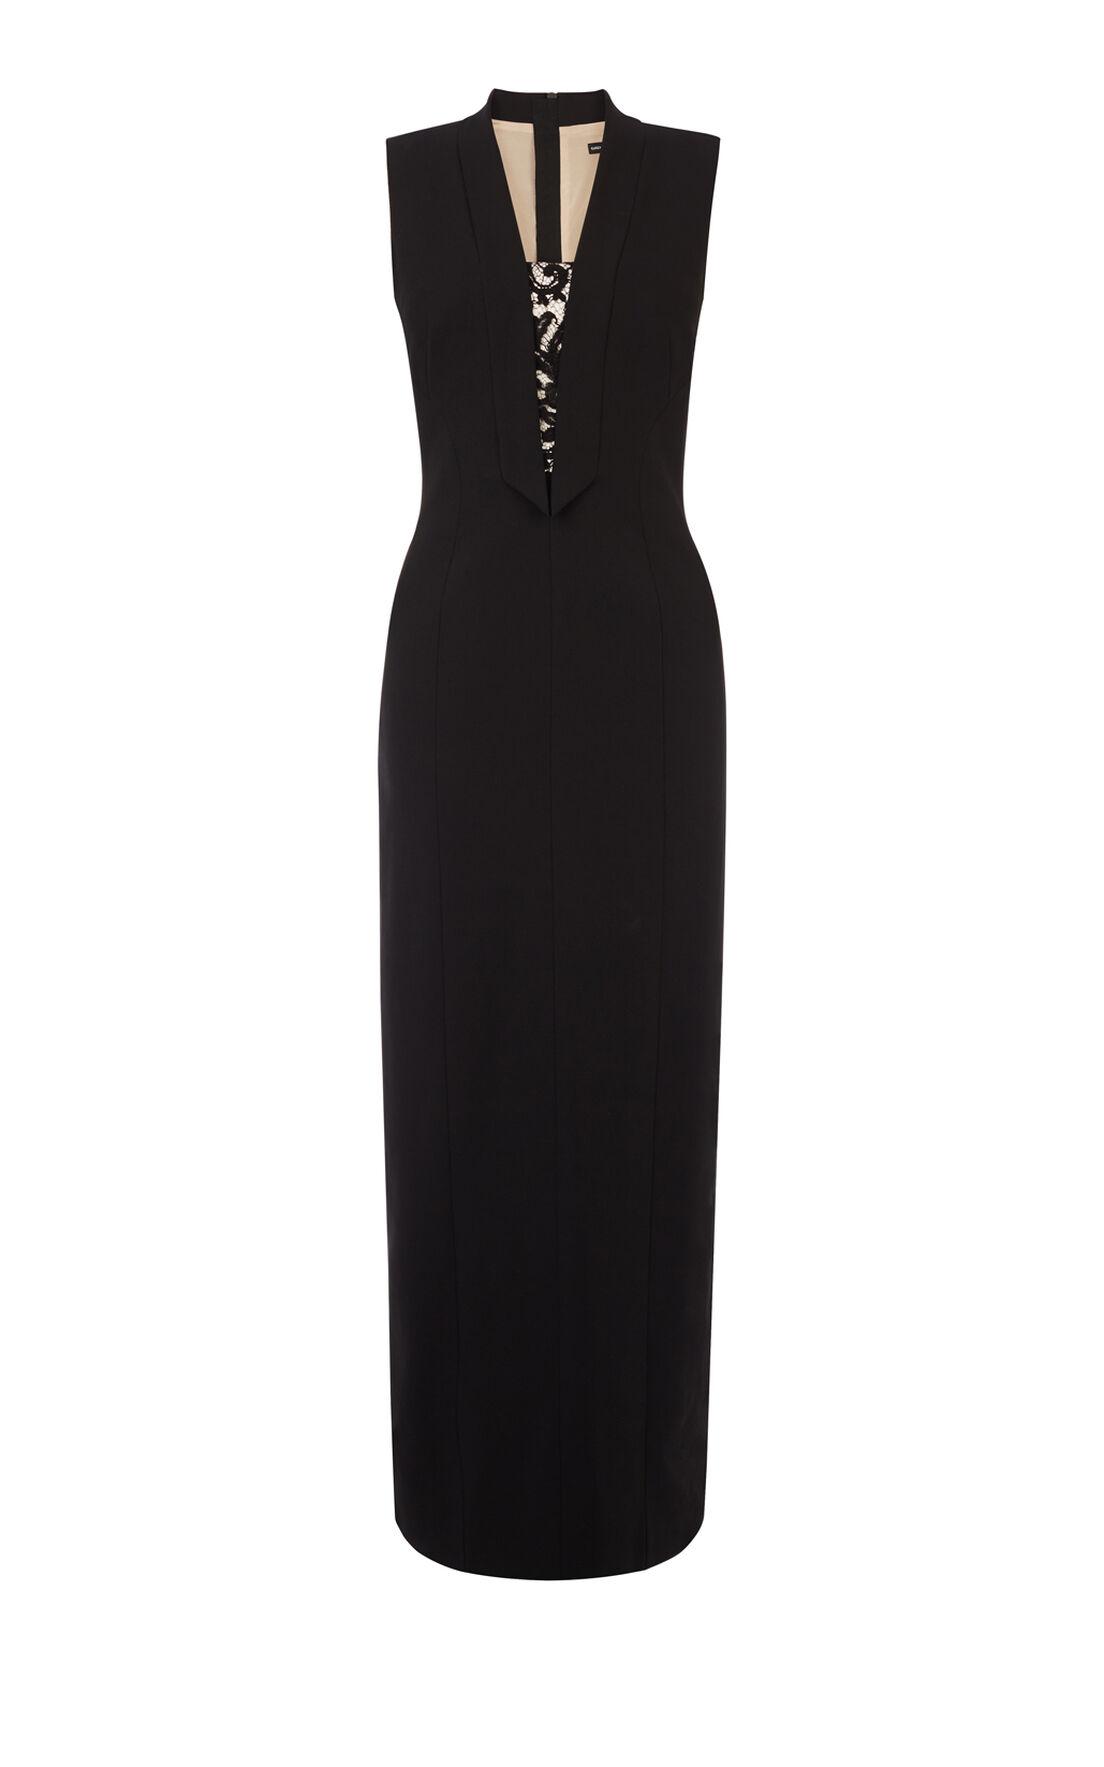 Karen Millen, TUXEDO MAXI DRESS Blk & Ivry 0